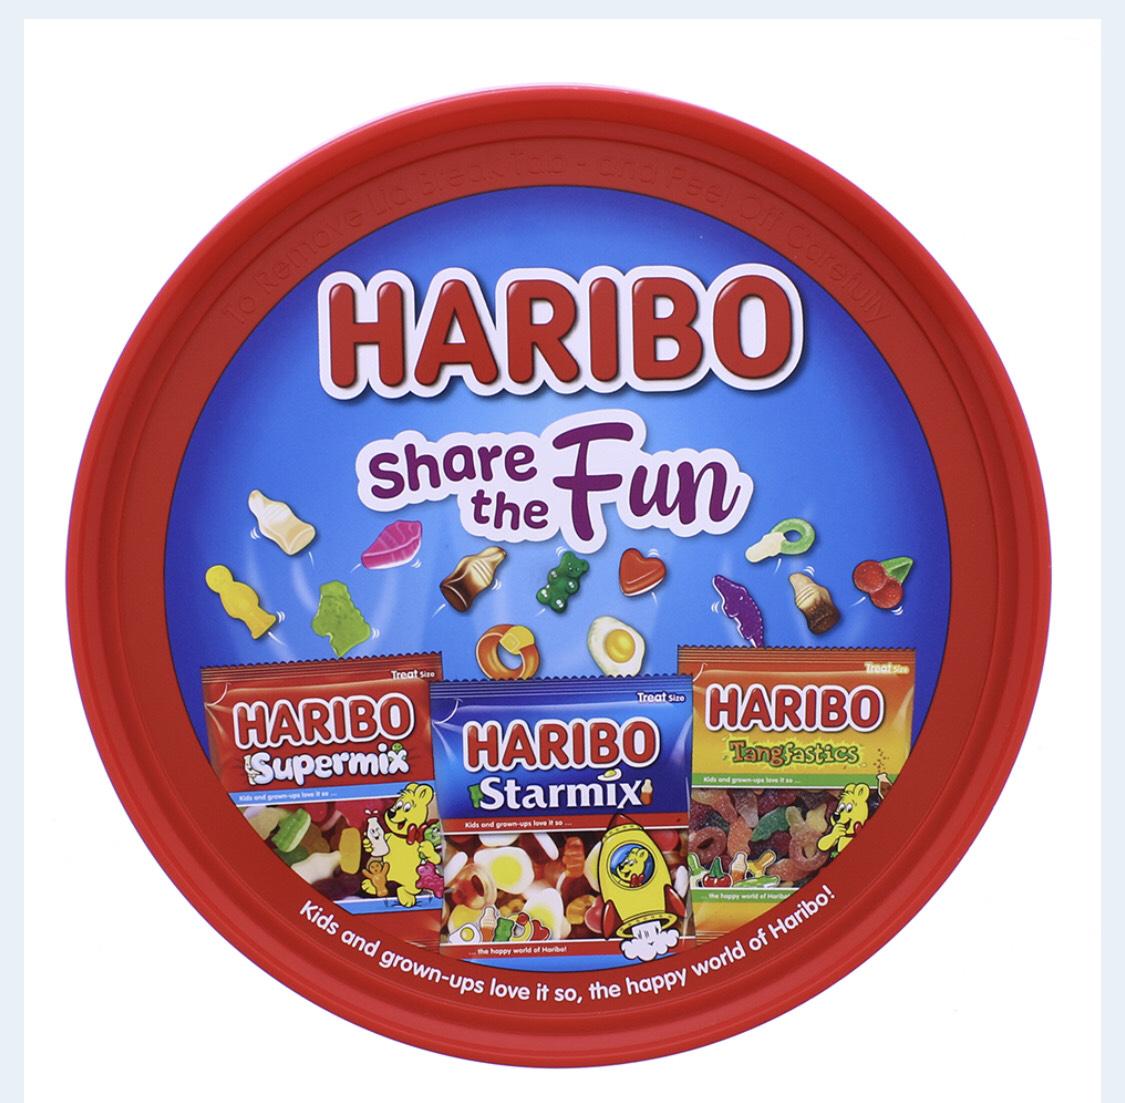 Haribo Share the Fun Sweets Tub (600g) £1.99 at FarmFoods Wednesbury